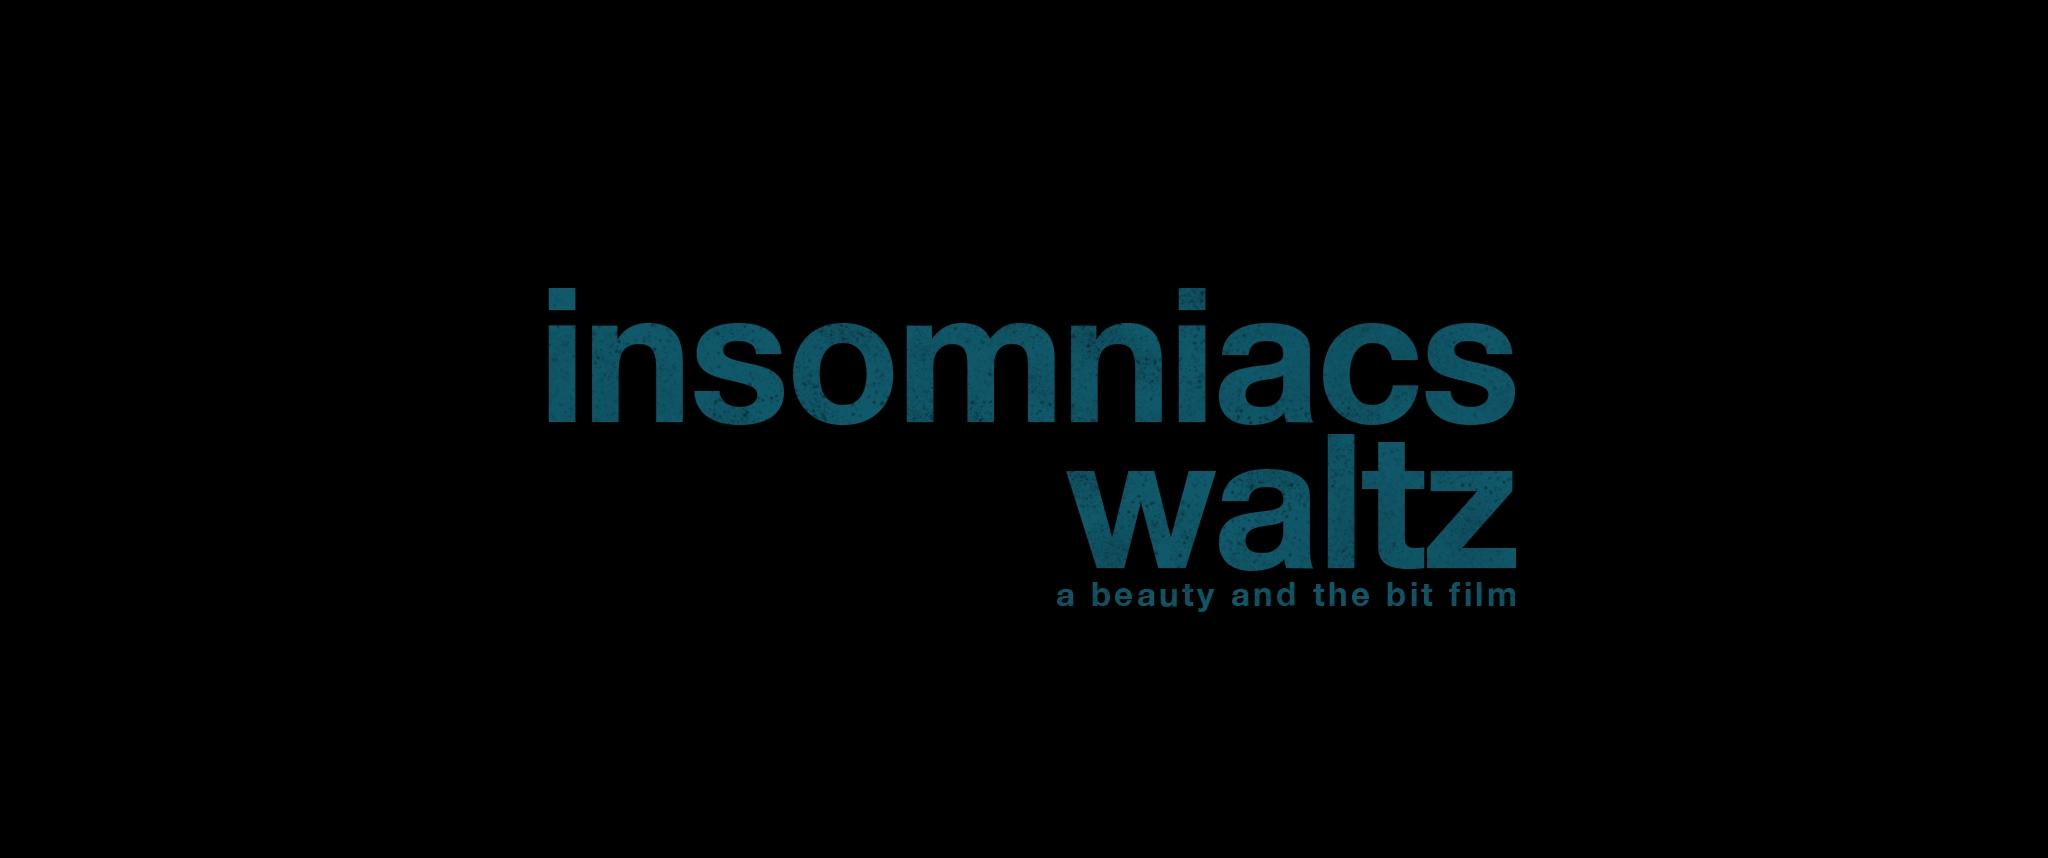 Insomniacs Waltz, Beauty and The Bit